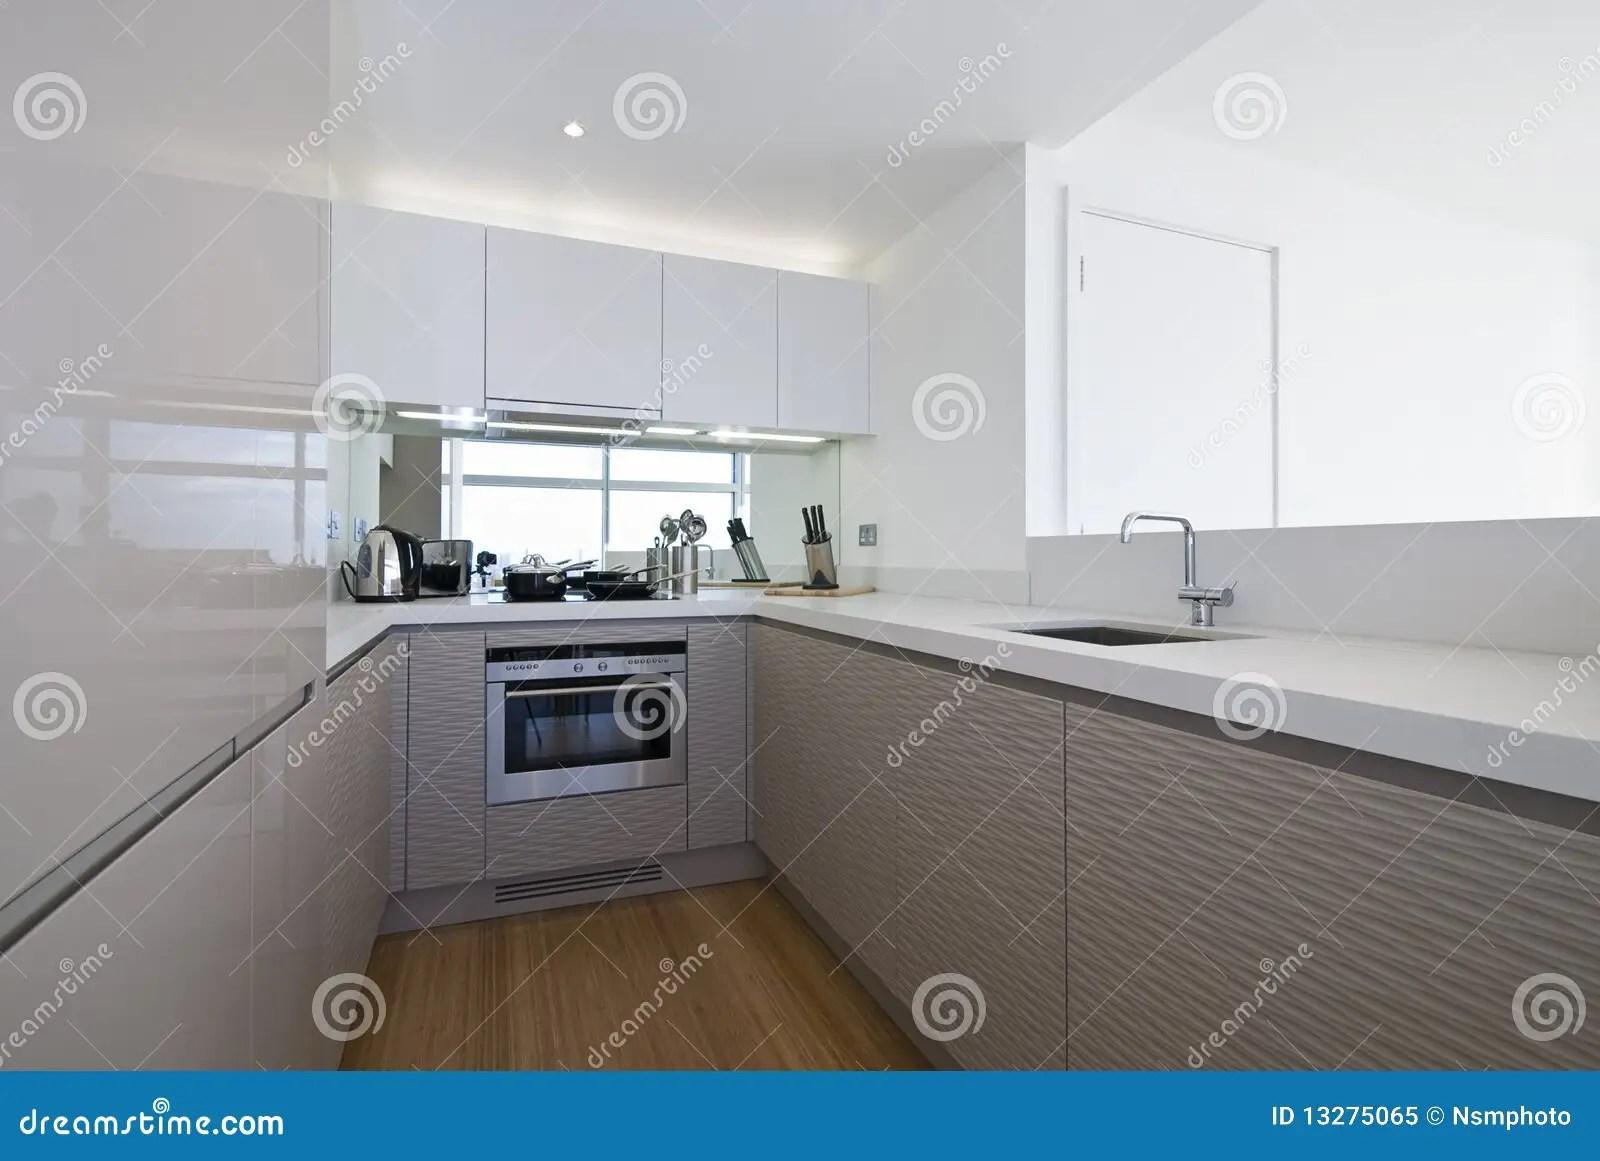 in stock kitchens kitchen cabinet door replacement lowes 设计员厨房白色库存图片 图片包括有设计 玻璃 最小 平面 室内 镀铬 工具设计员厨房现代白色